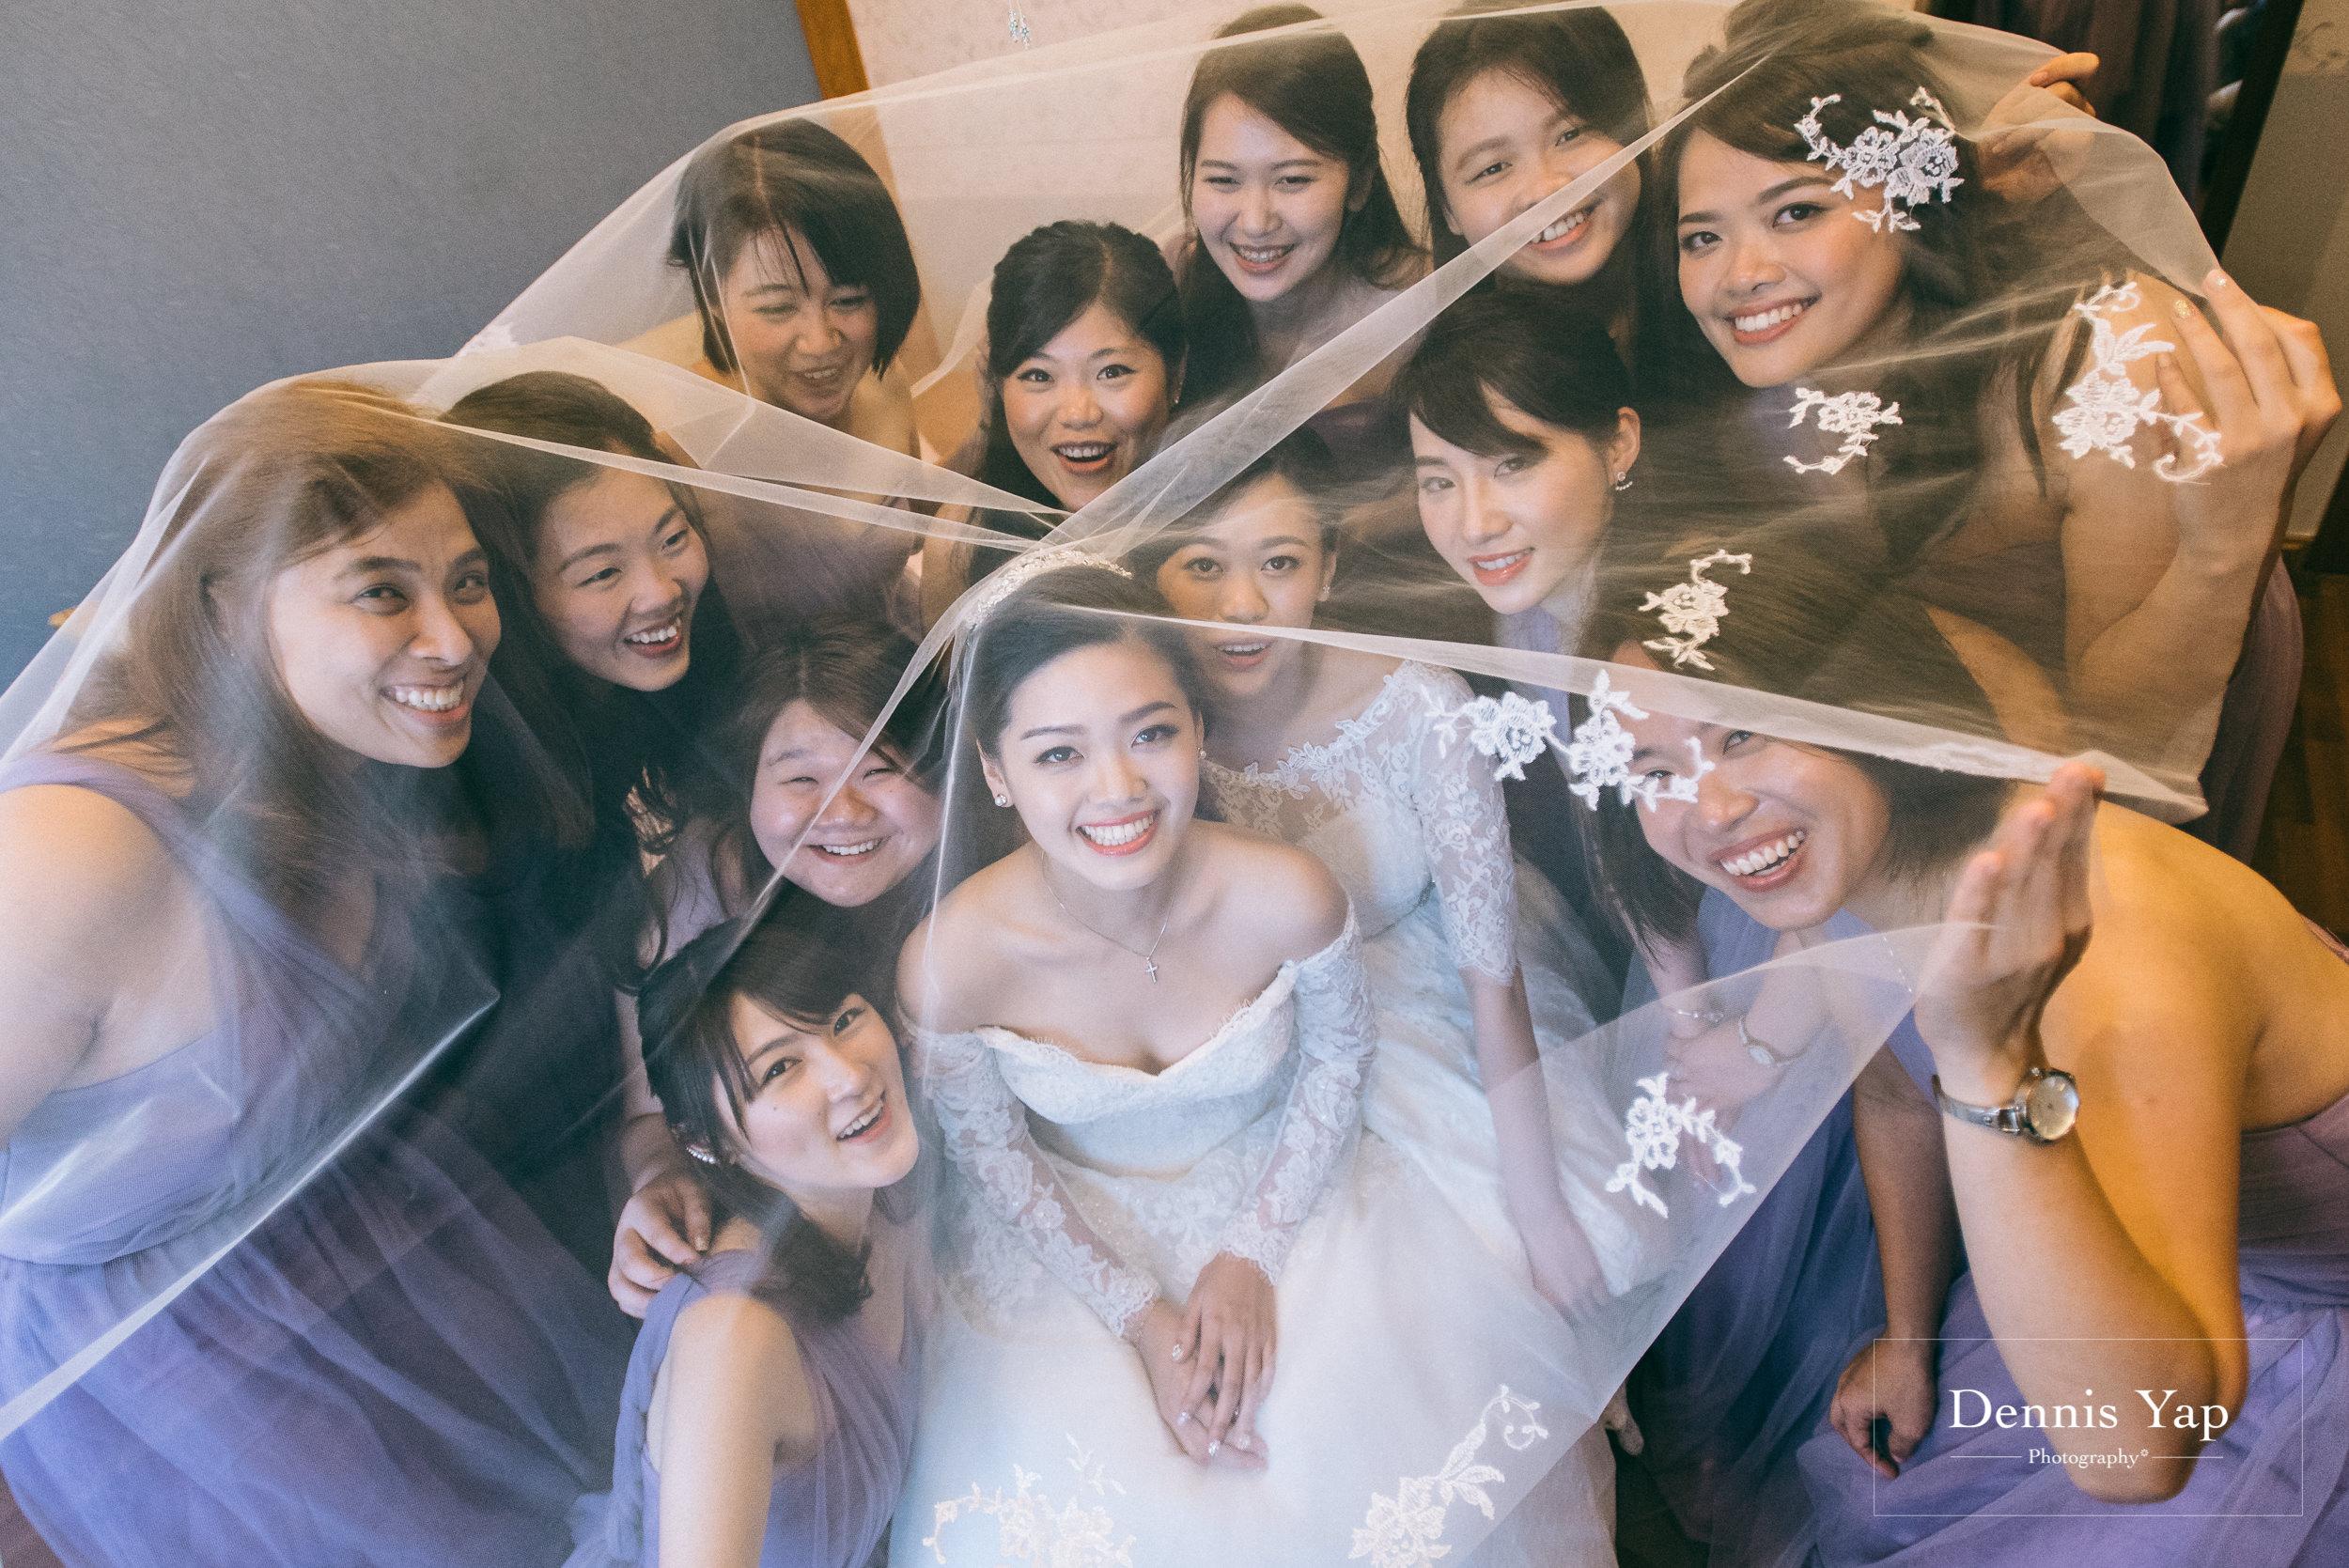 jonathan christabelle wedding church kota kinabalu dennis yap photography malaysia -8.jpg